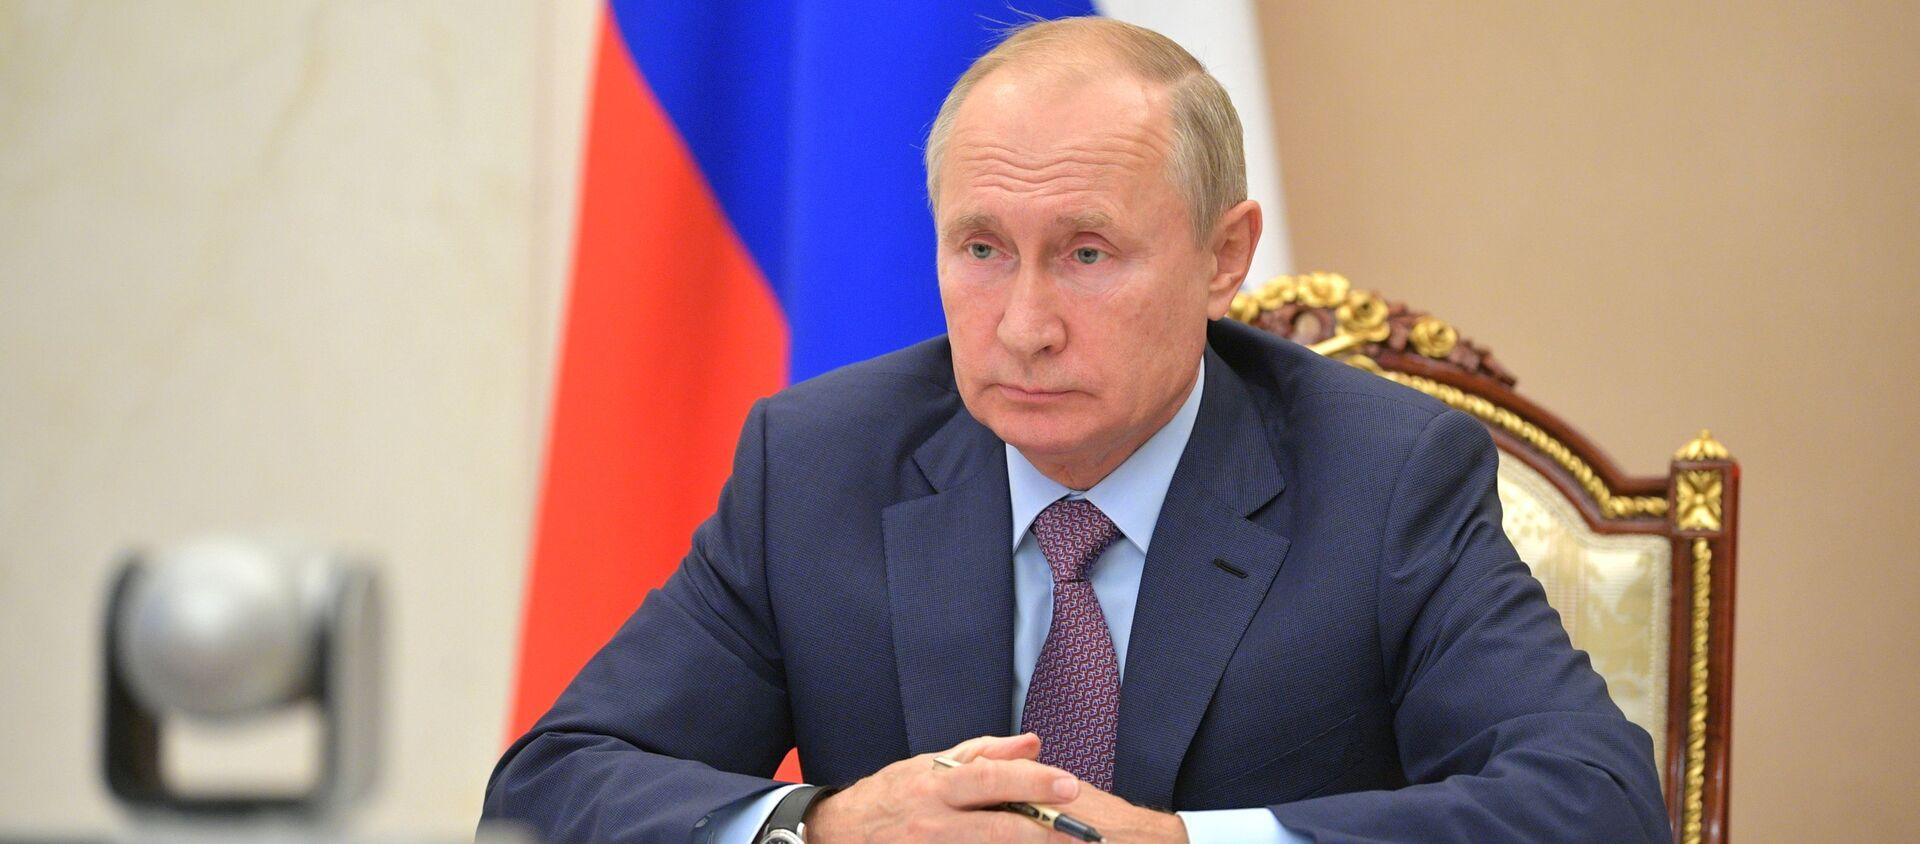 Tổng thống Nga Vladimir Putin. - Sputnik Việt Nam, 1920, 16.02.2021